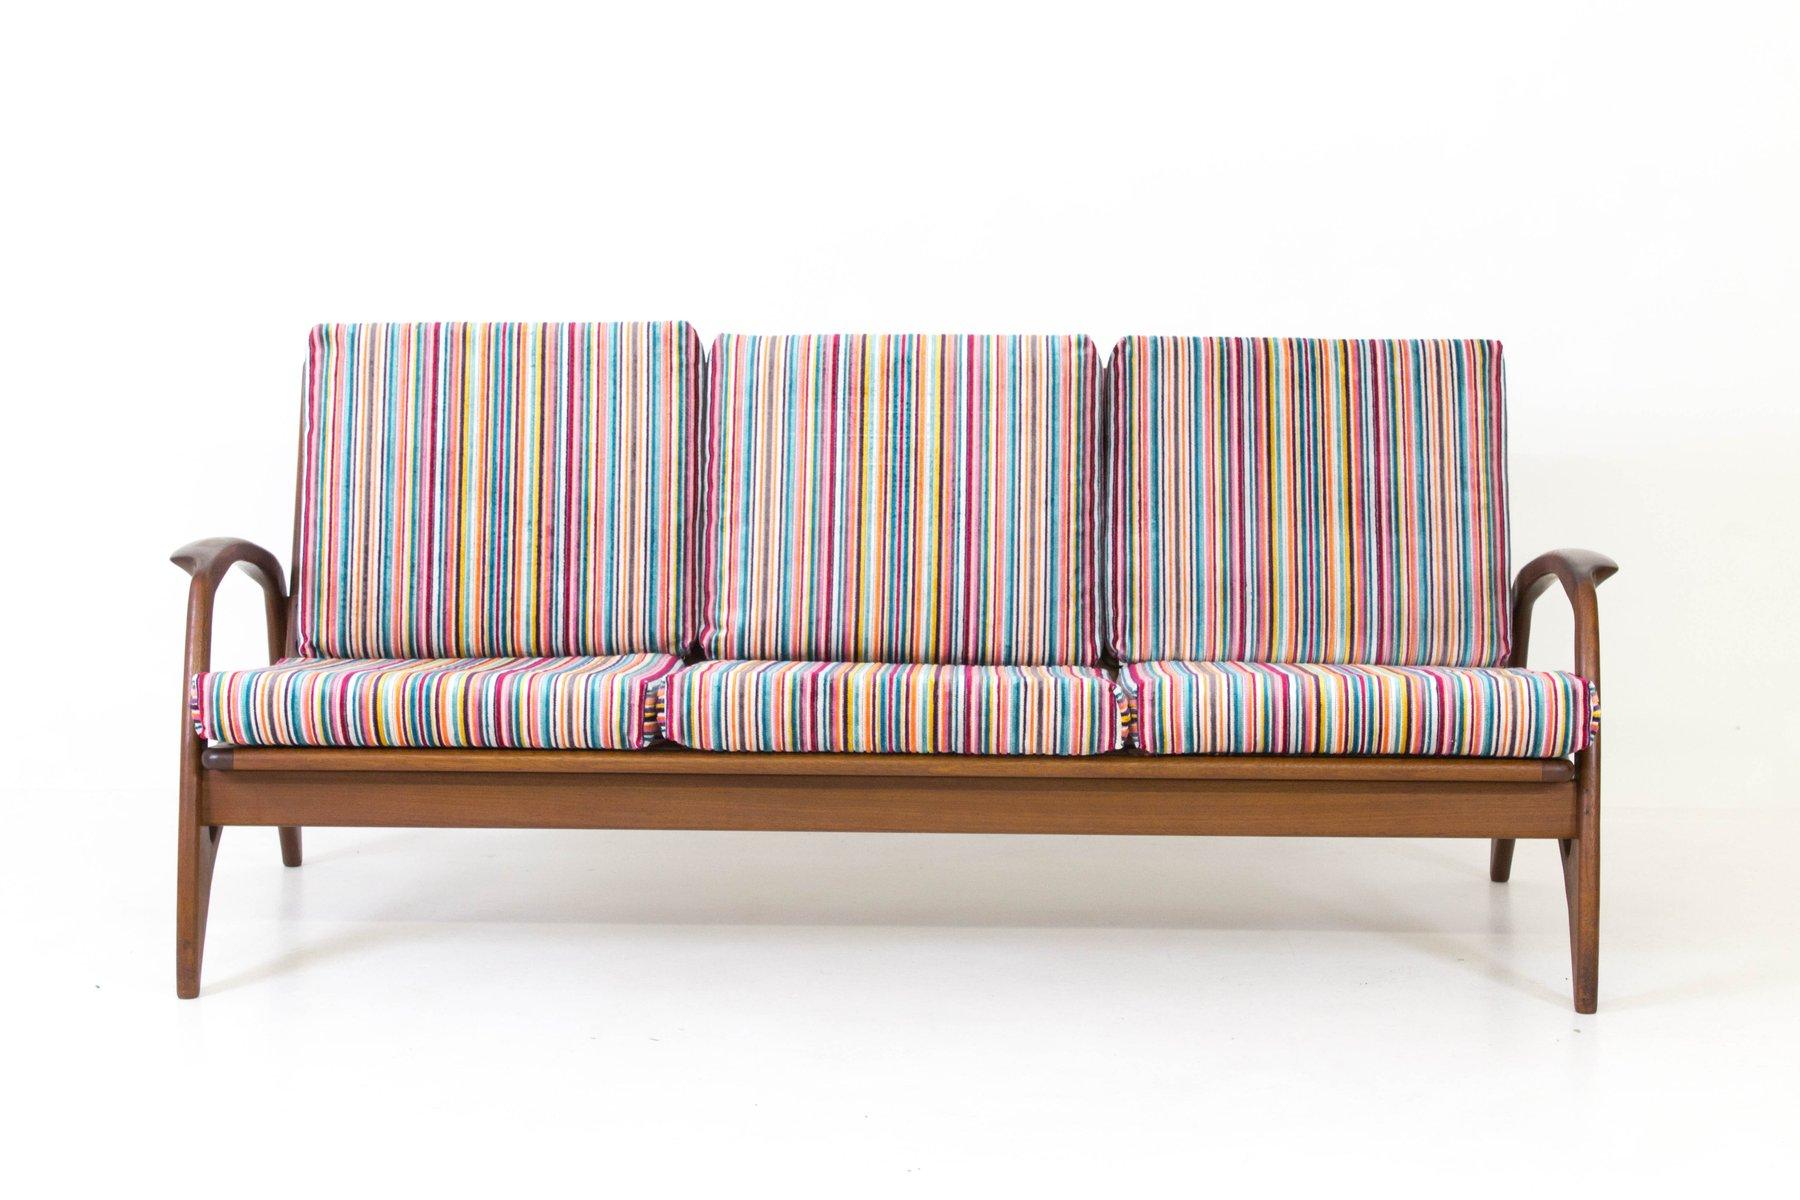 Organic Teak Sofa From De Ster Gelderland, 1960s